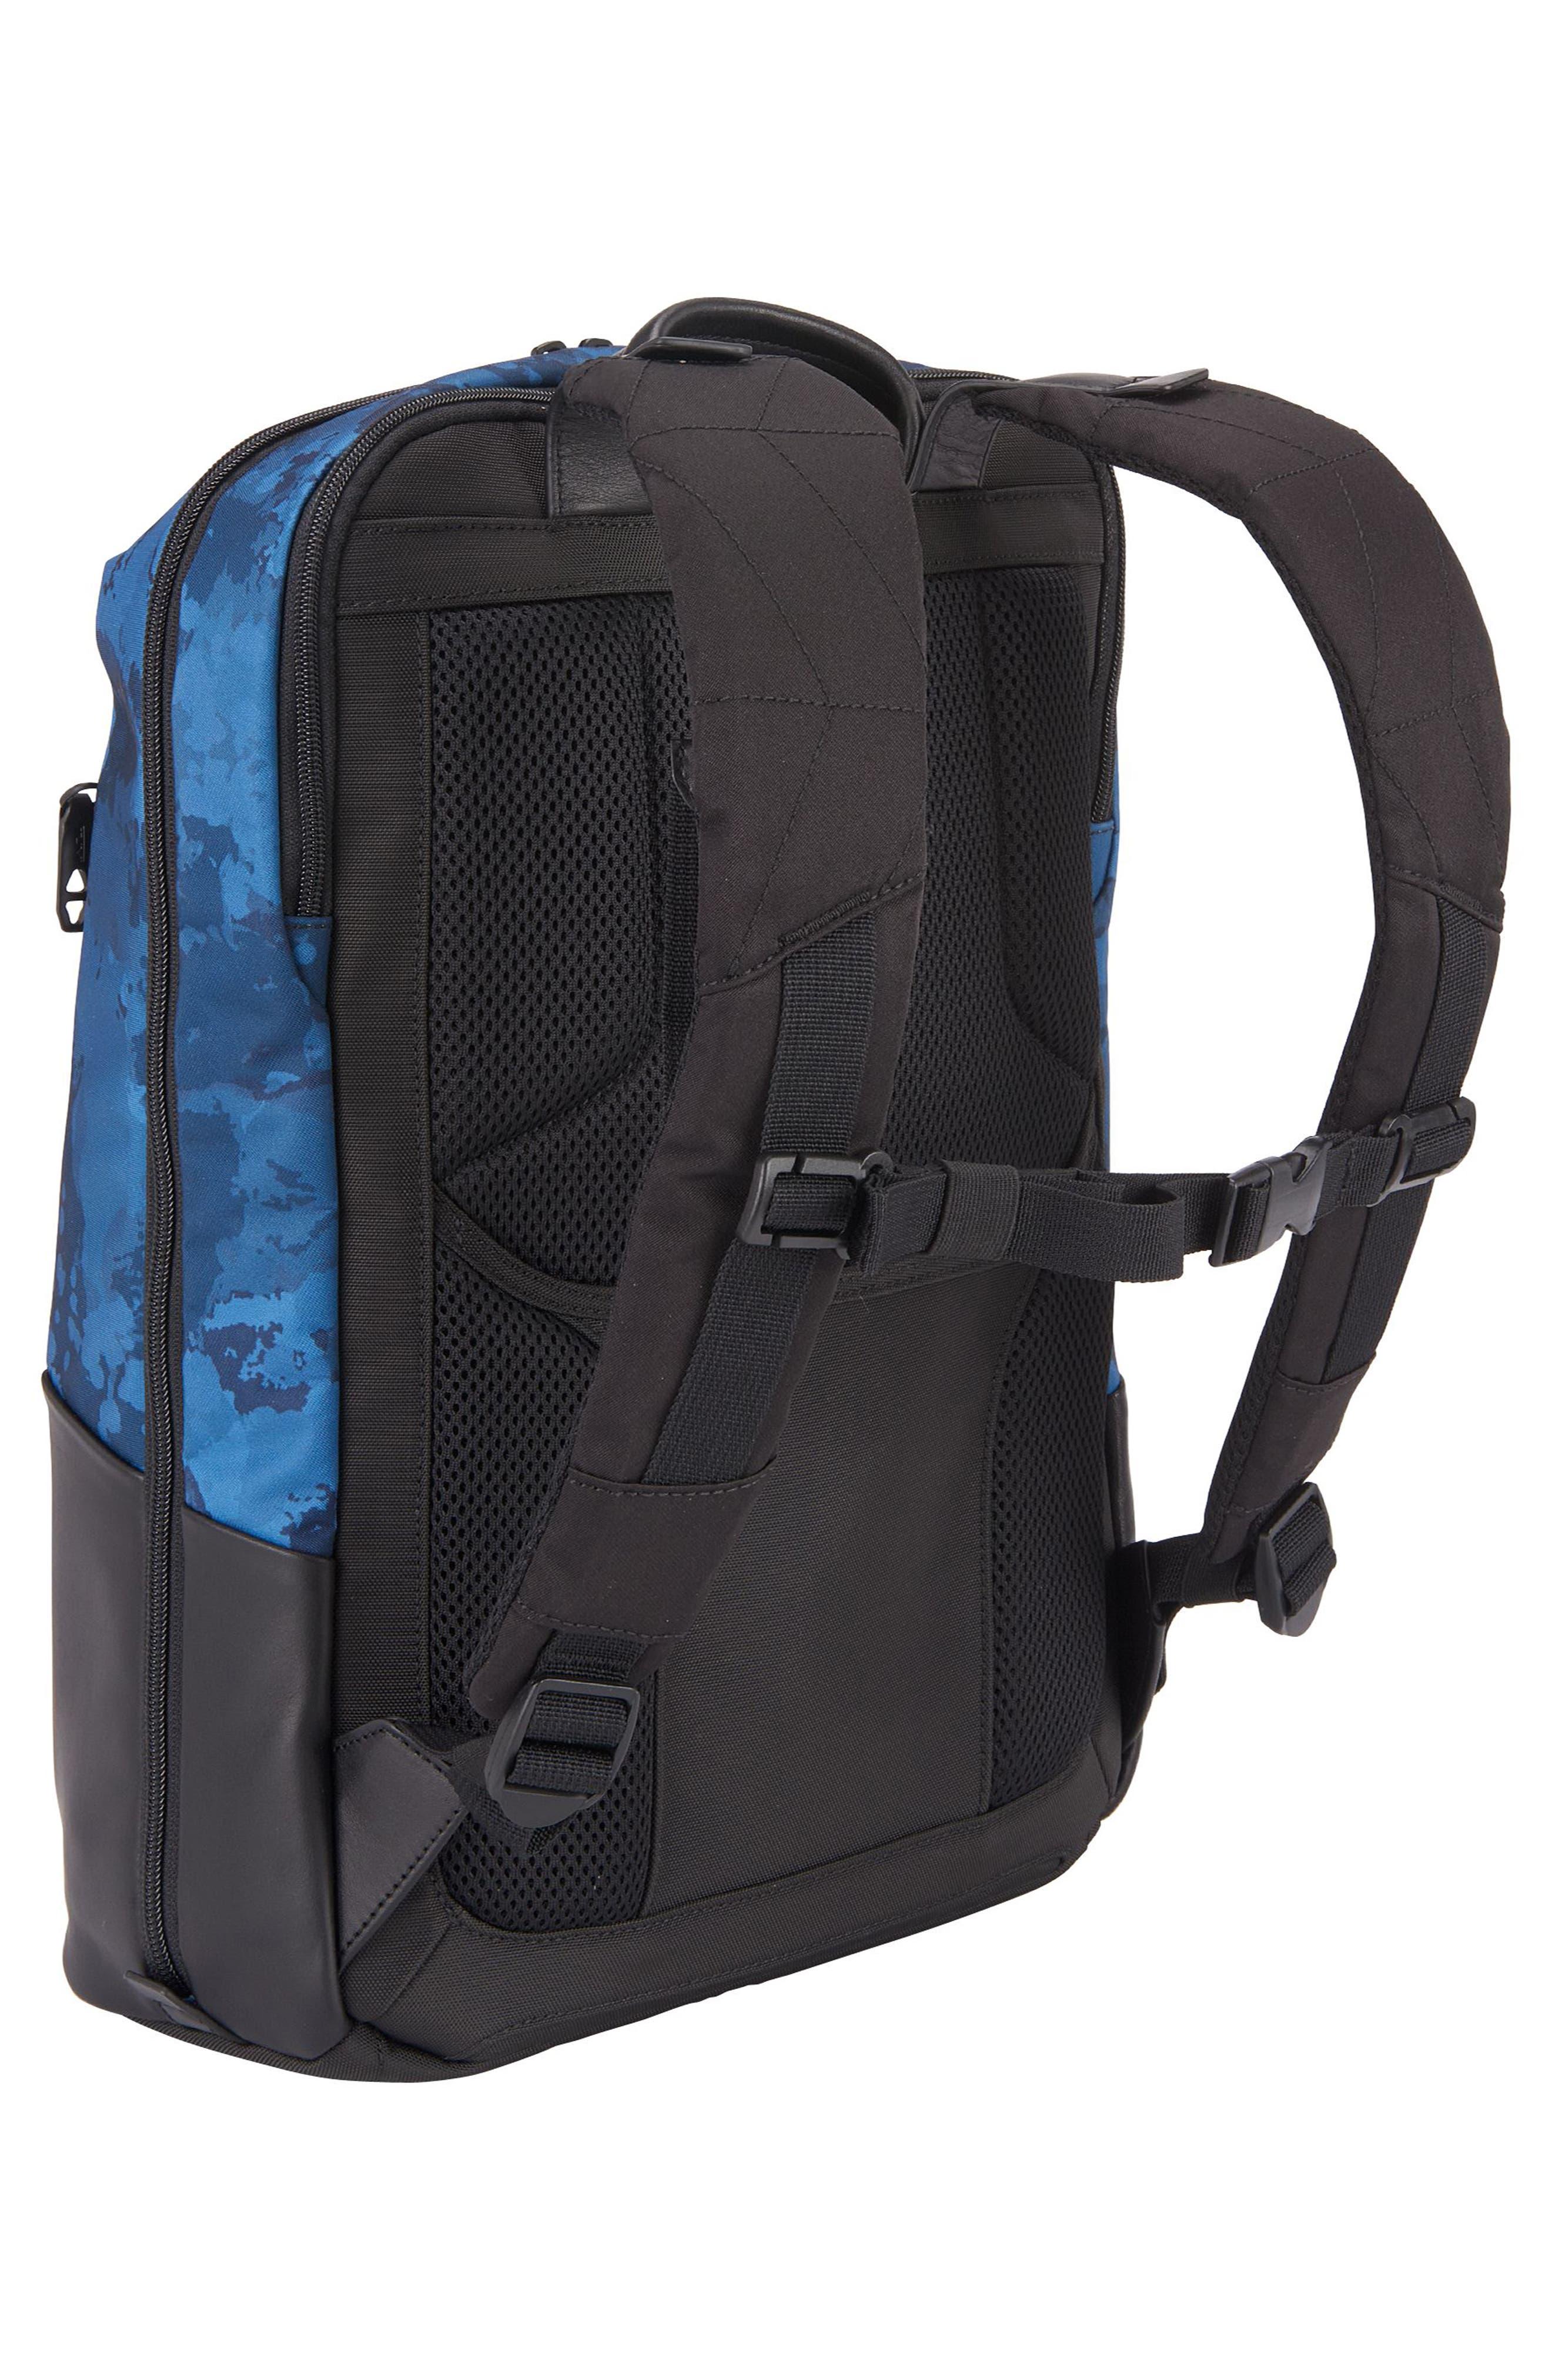 Tahoe - Butler Backpack,                             Alternate thumbnail 2, color,                             430